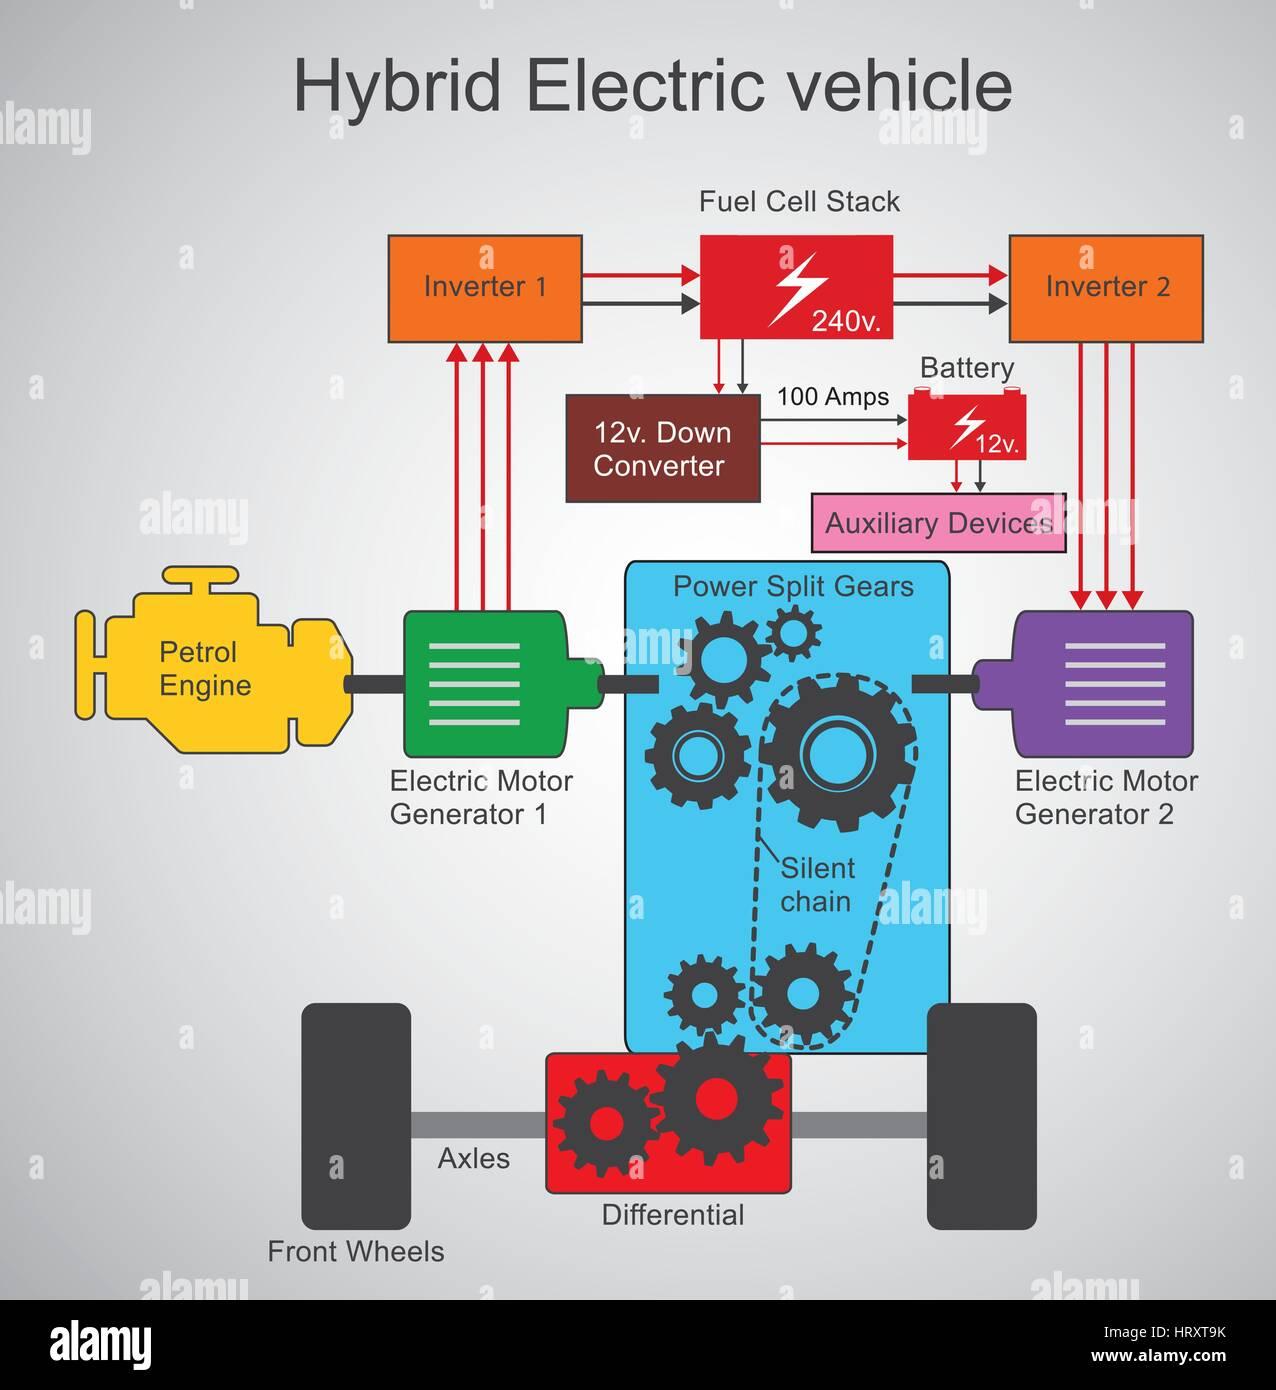 electric motor diagram stockfotos electric motor diagram. Black Bedroom Furniture Sets. Home Design Ideas